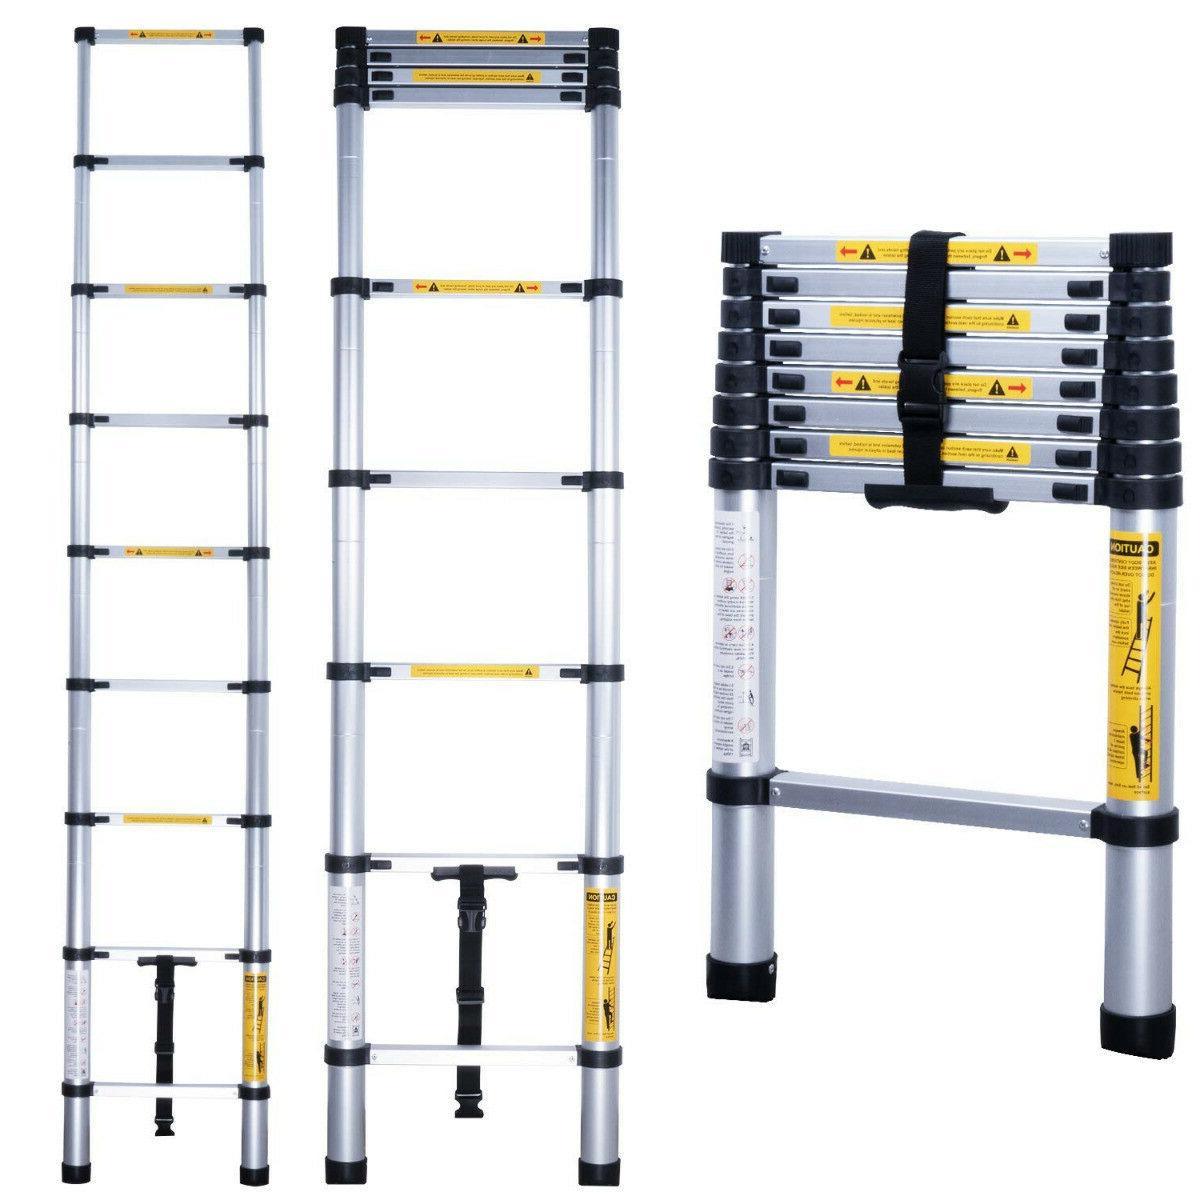 8.5/10.5/12.5/15.5 Telescopic Ladders